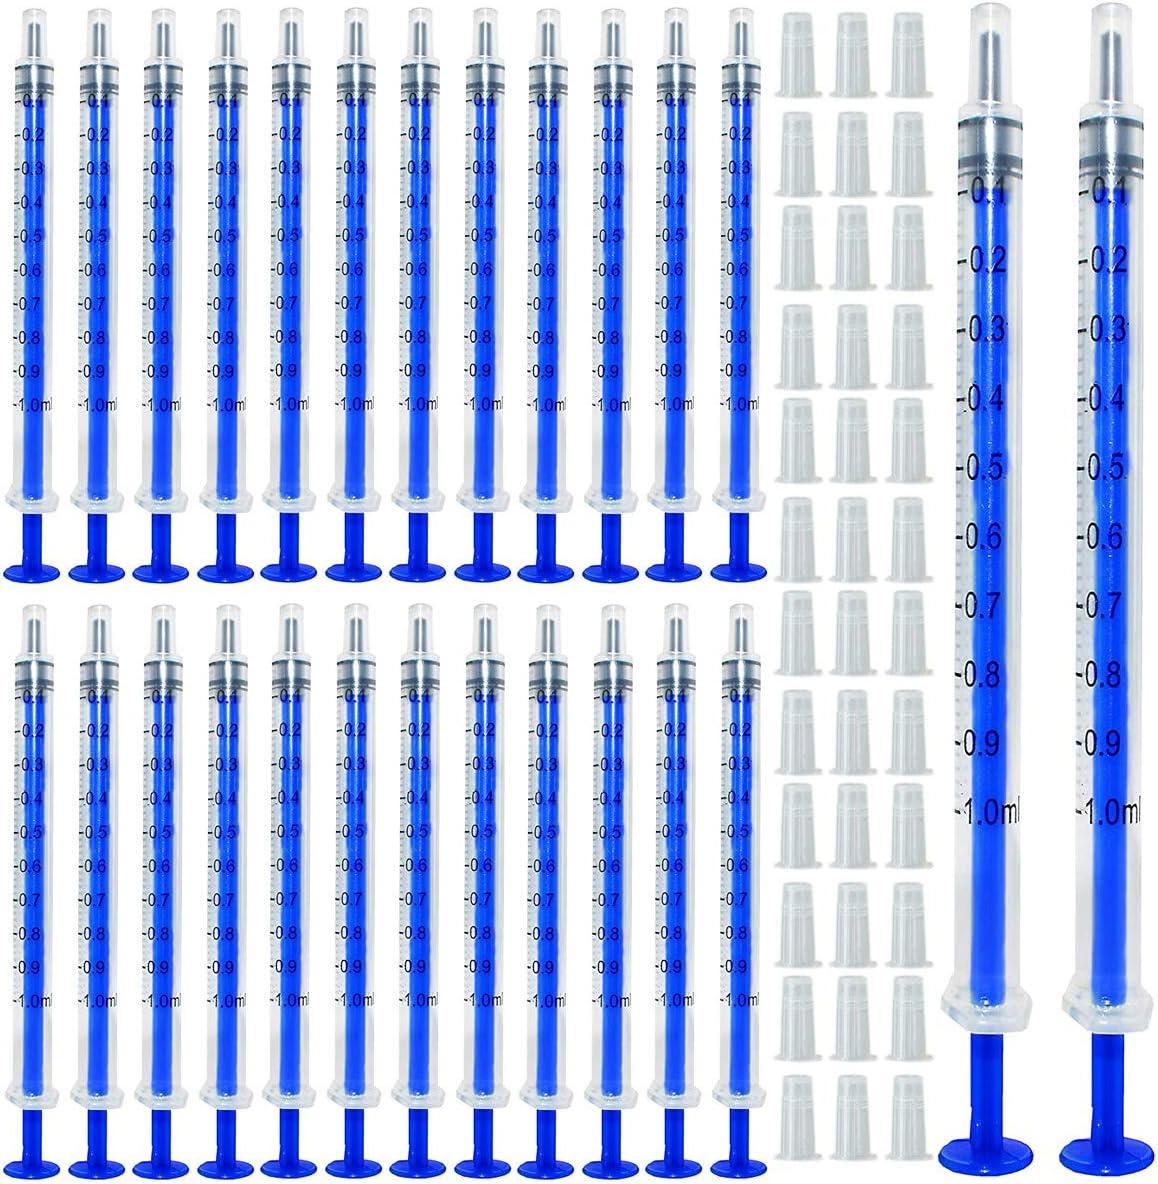 Gebildet 100pcs 1ml Jeringa de Plastico(sin aguja) con Tapas, Jeringa Desechable, para Alimentar Alimentos o Medicinas a su Mascota, Perfumes, Lubricantes, Sellantes etc.